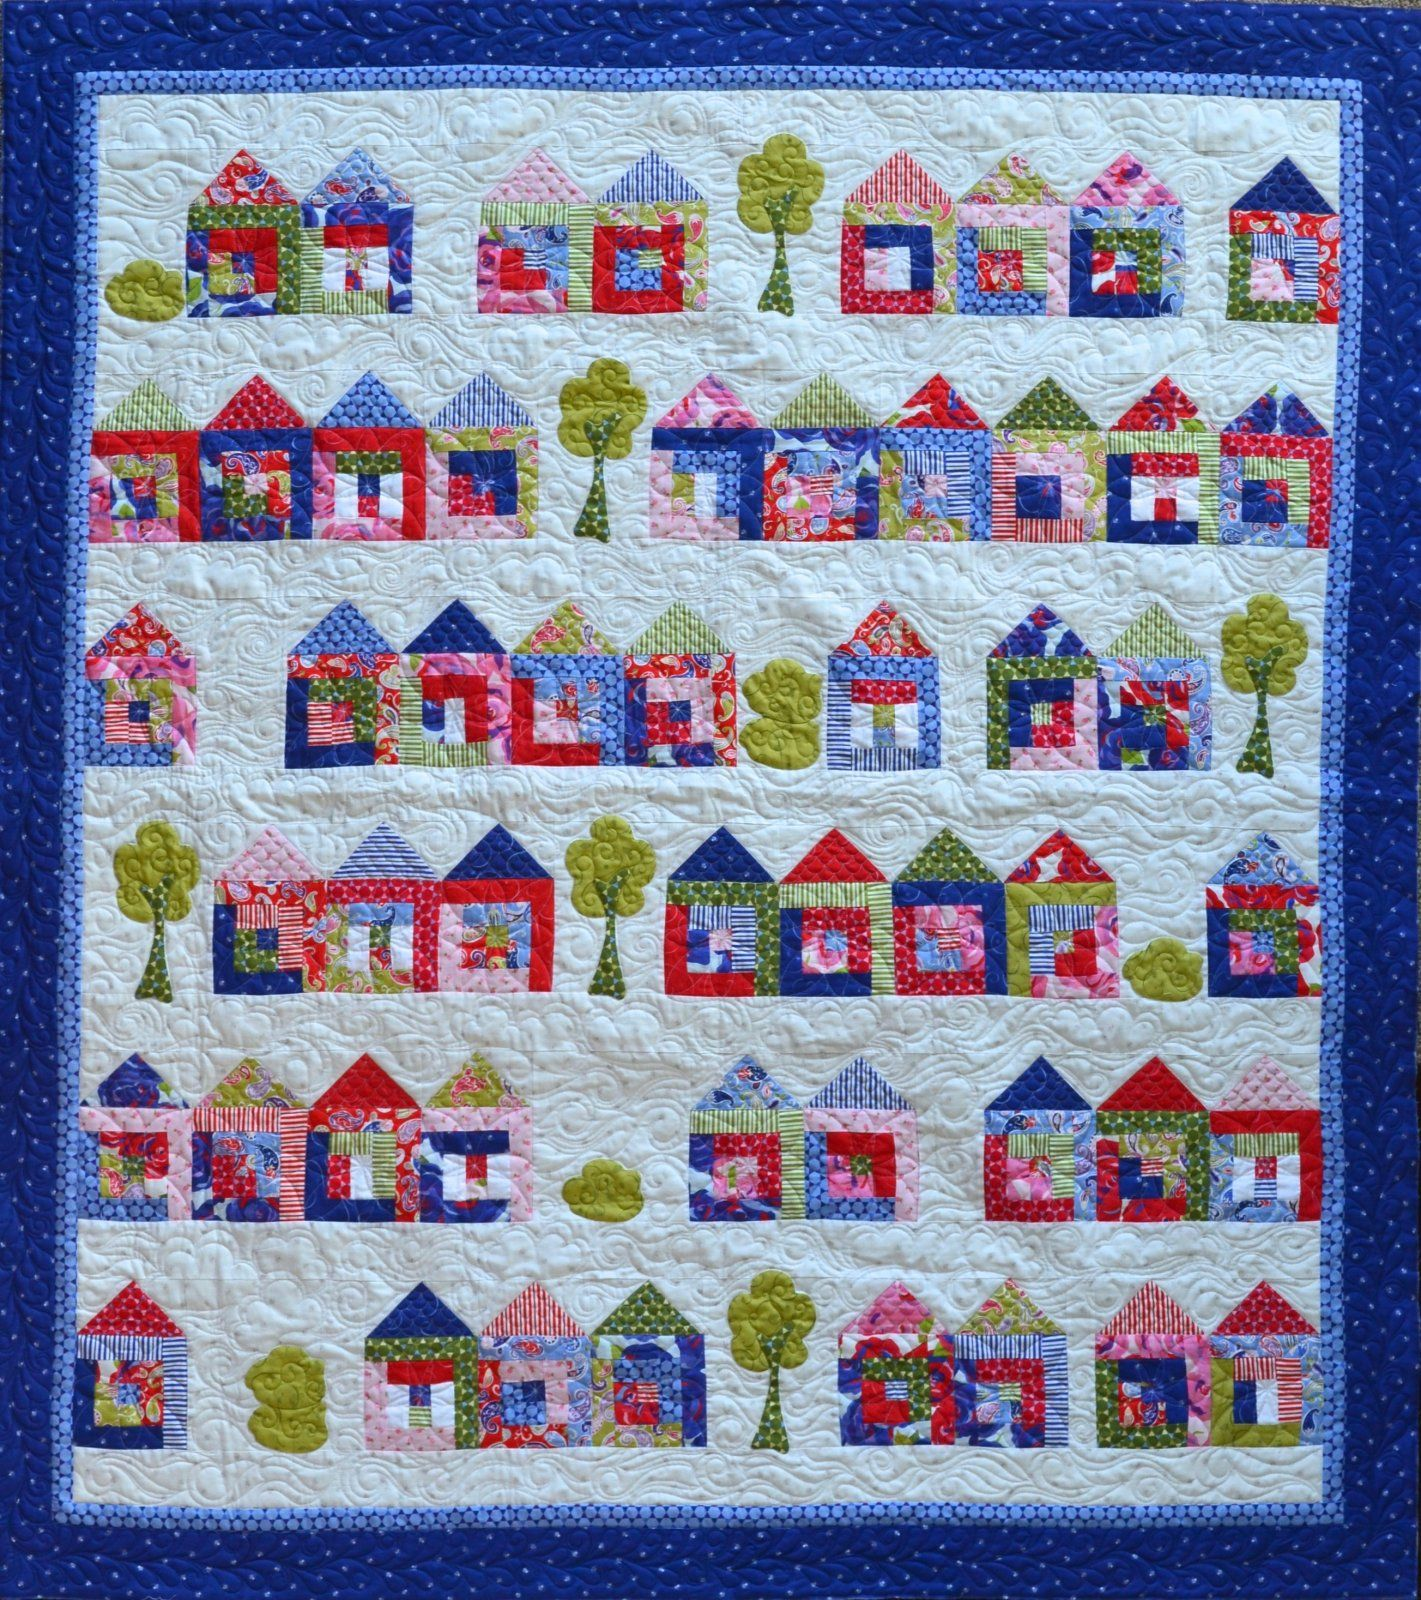 Tiny House Craze Quilt At Jillily Studio House Quilt